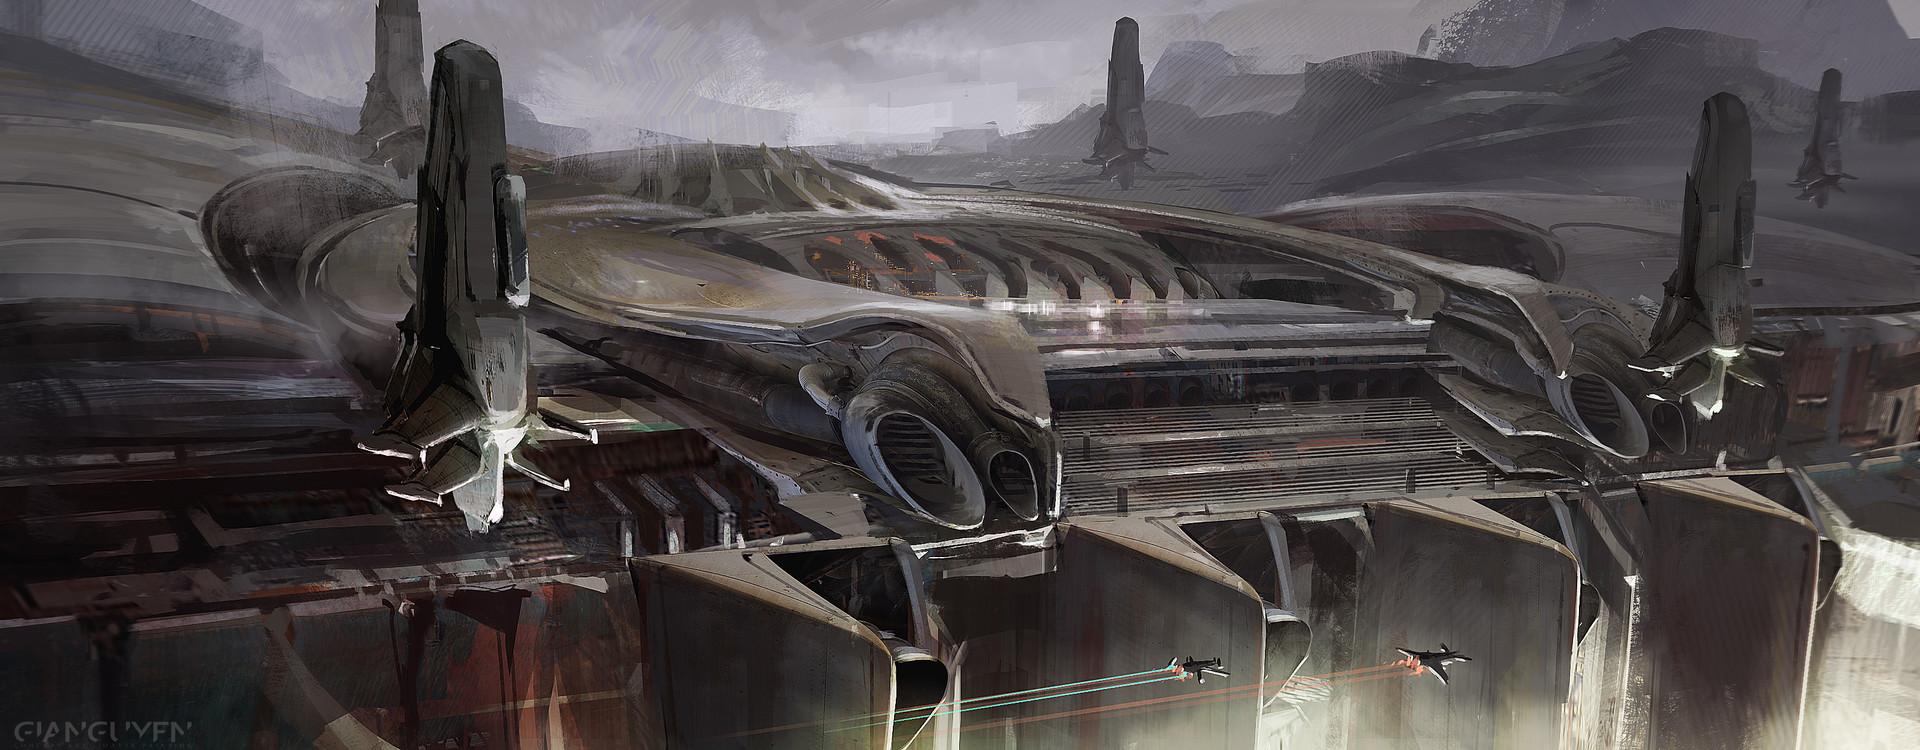 Gia nguyen sketch2 as